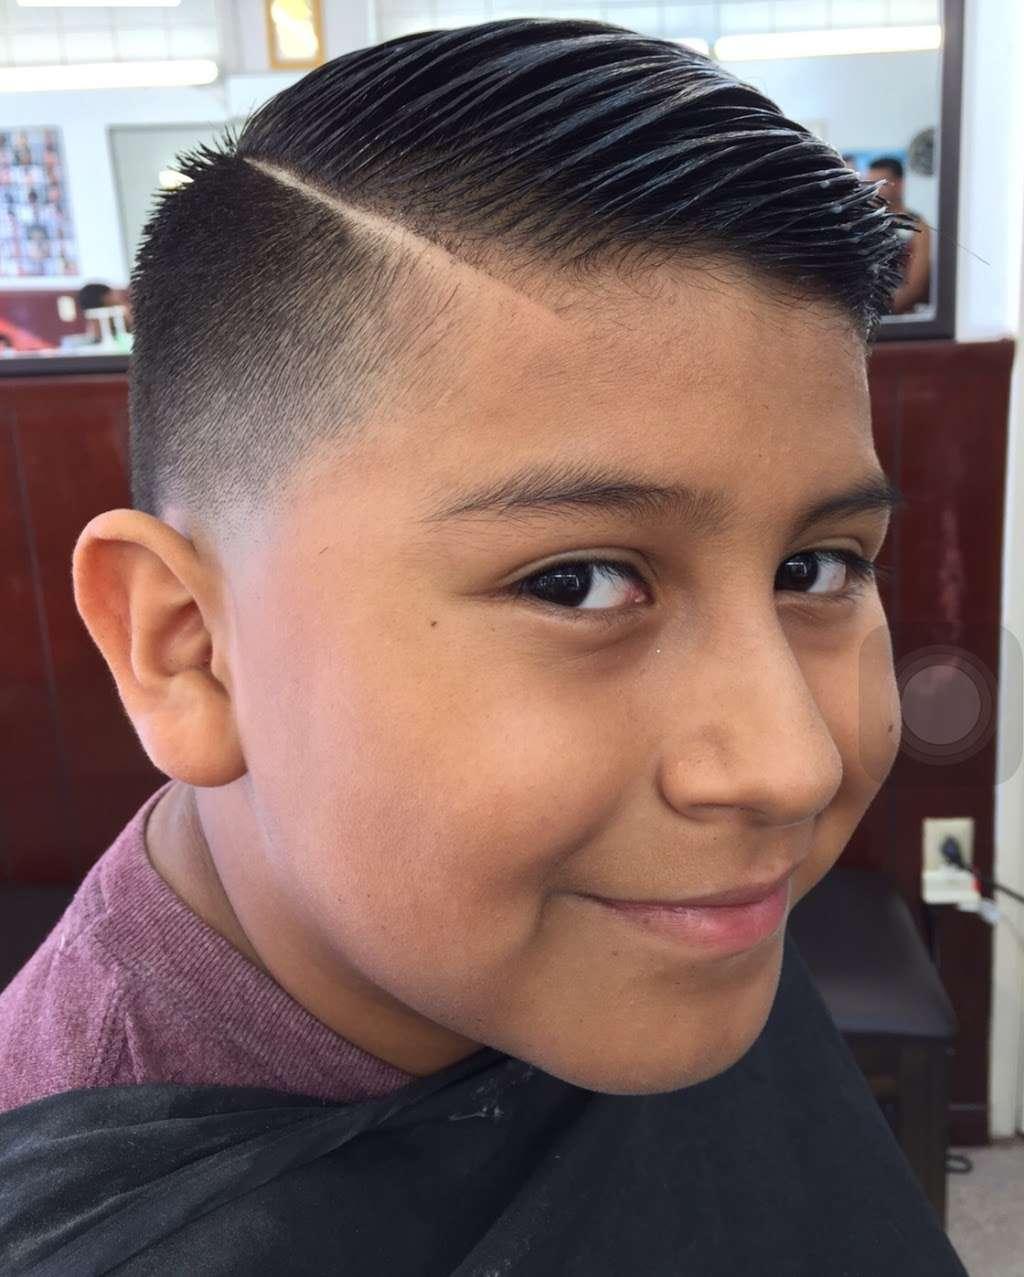 La Mesa Barber Shop - hair care  | Photo 9 of 10 | Address: 8515 La Mesa Blvd, La Mesa, CA 91942, USA | Phone: (619) 908-9557